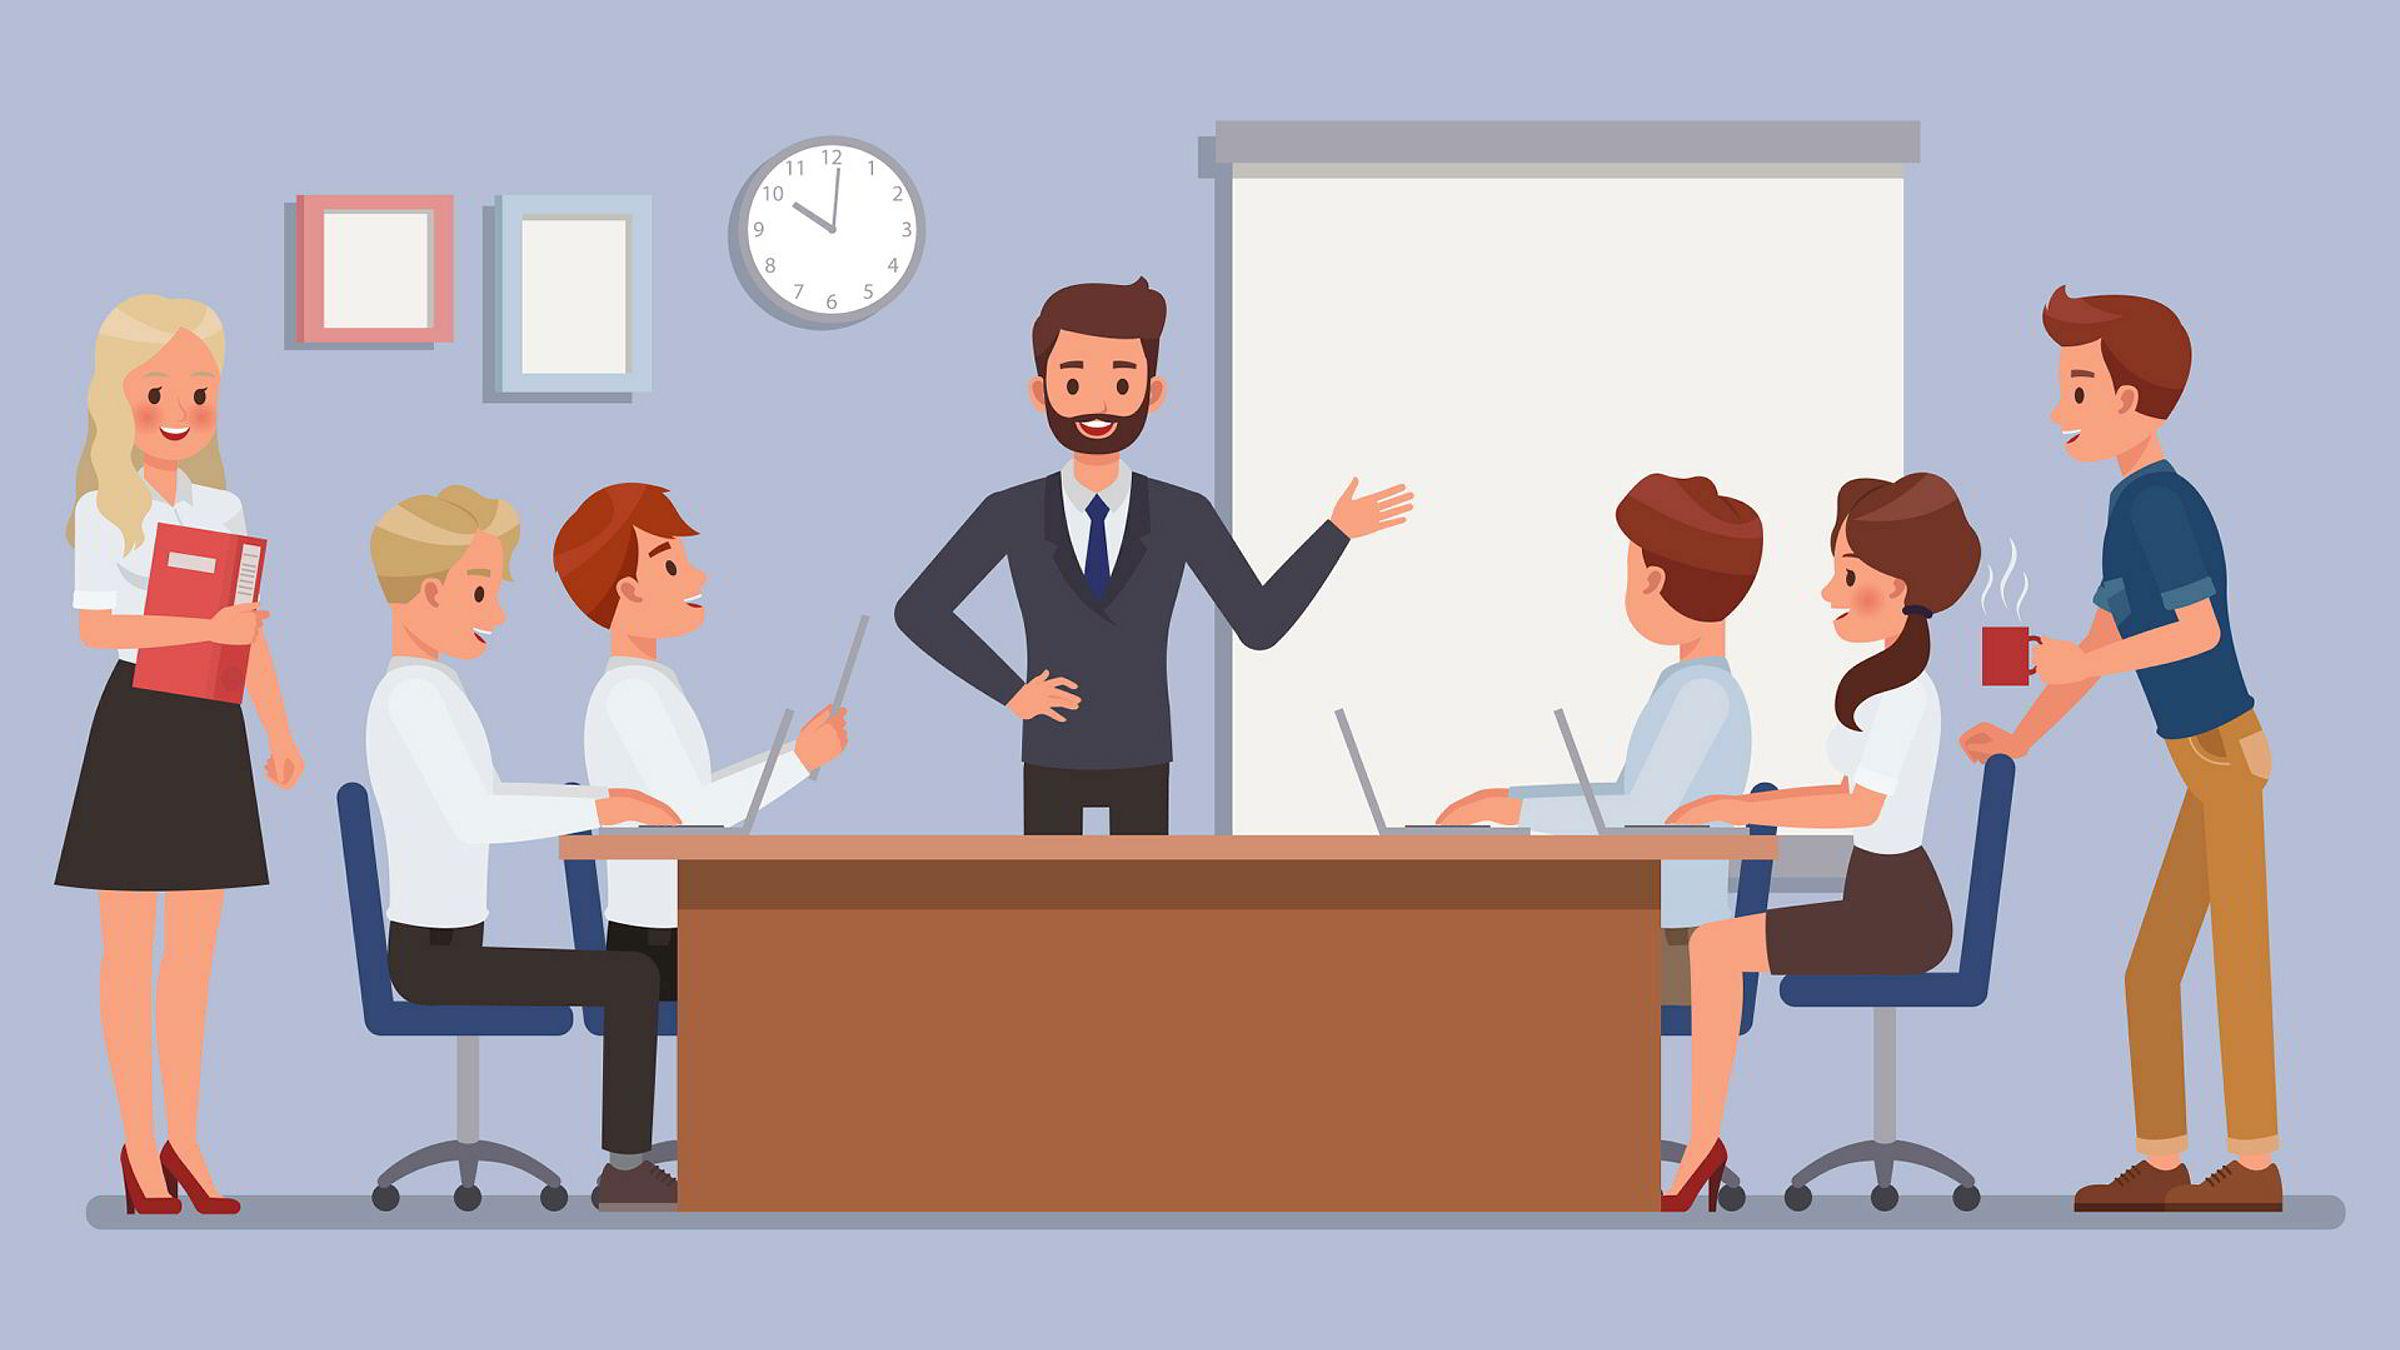 I moderne ledelsesforskning heter det at ledelse skal være effektivt, ikke «bare» godt, skriver artikkelforfatteren.